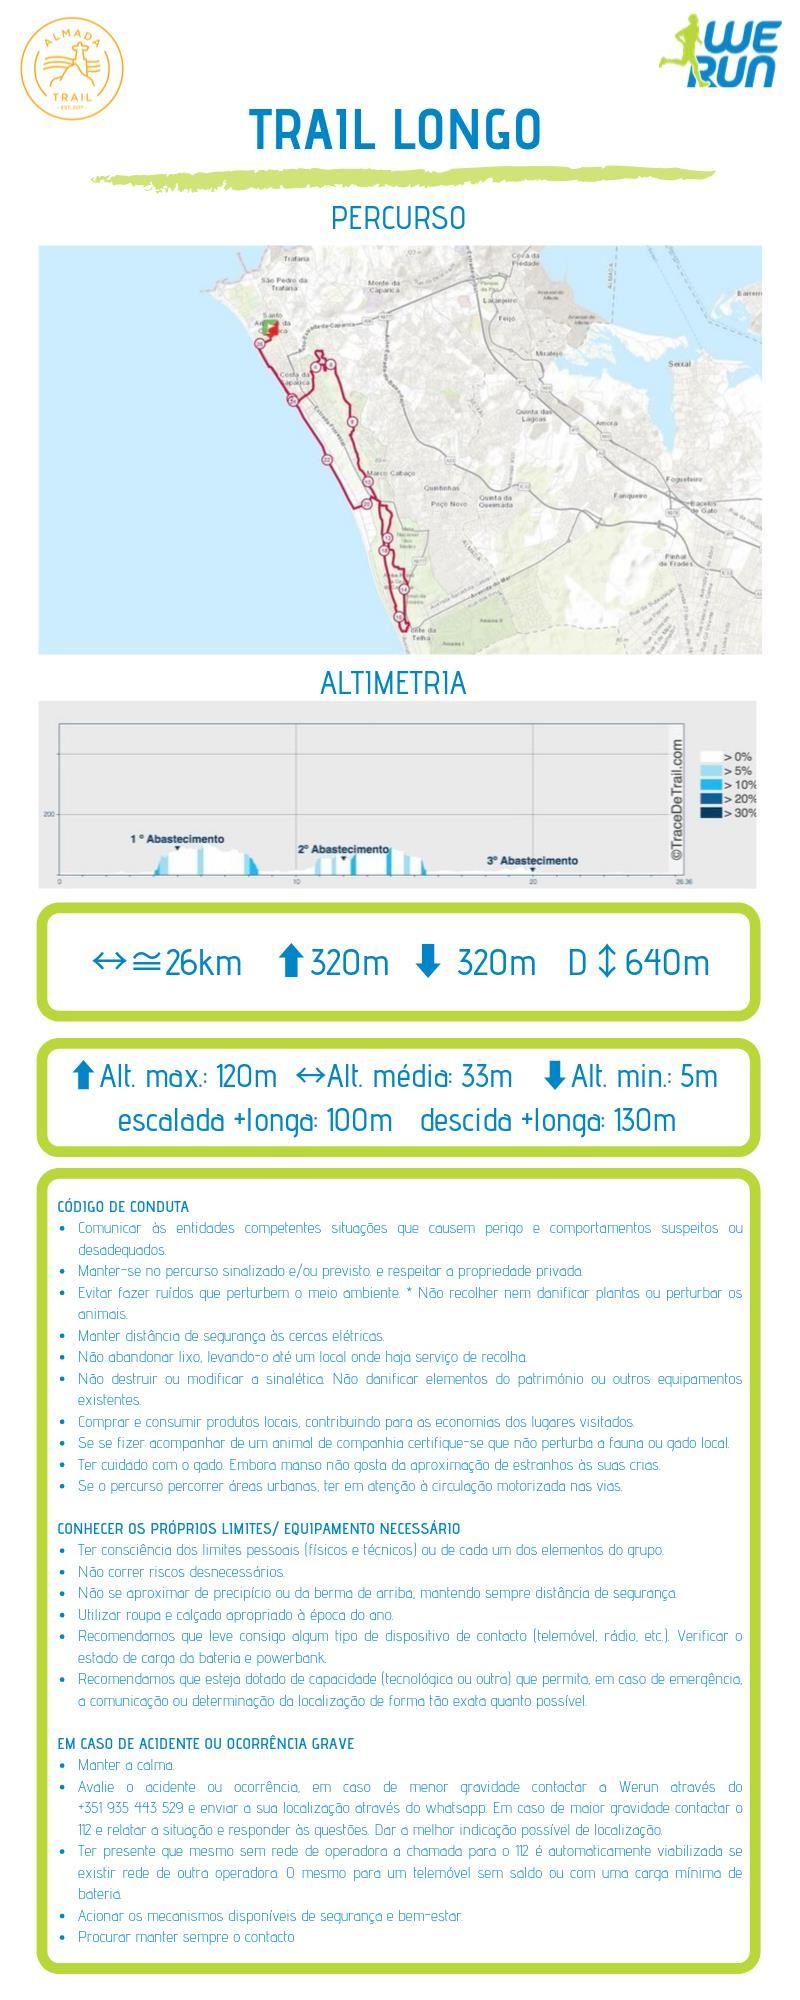 Almada Trail Route Map